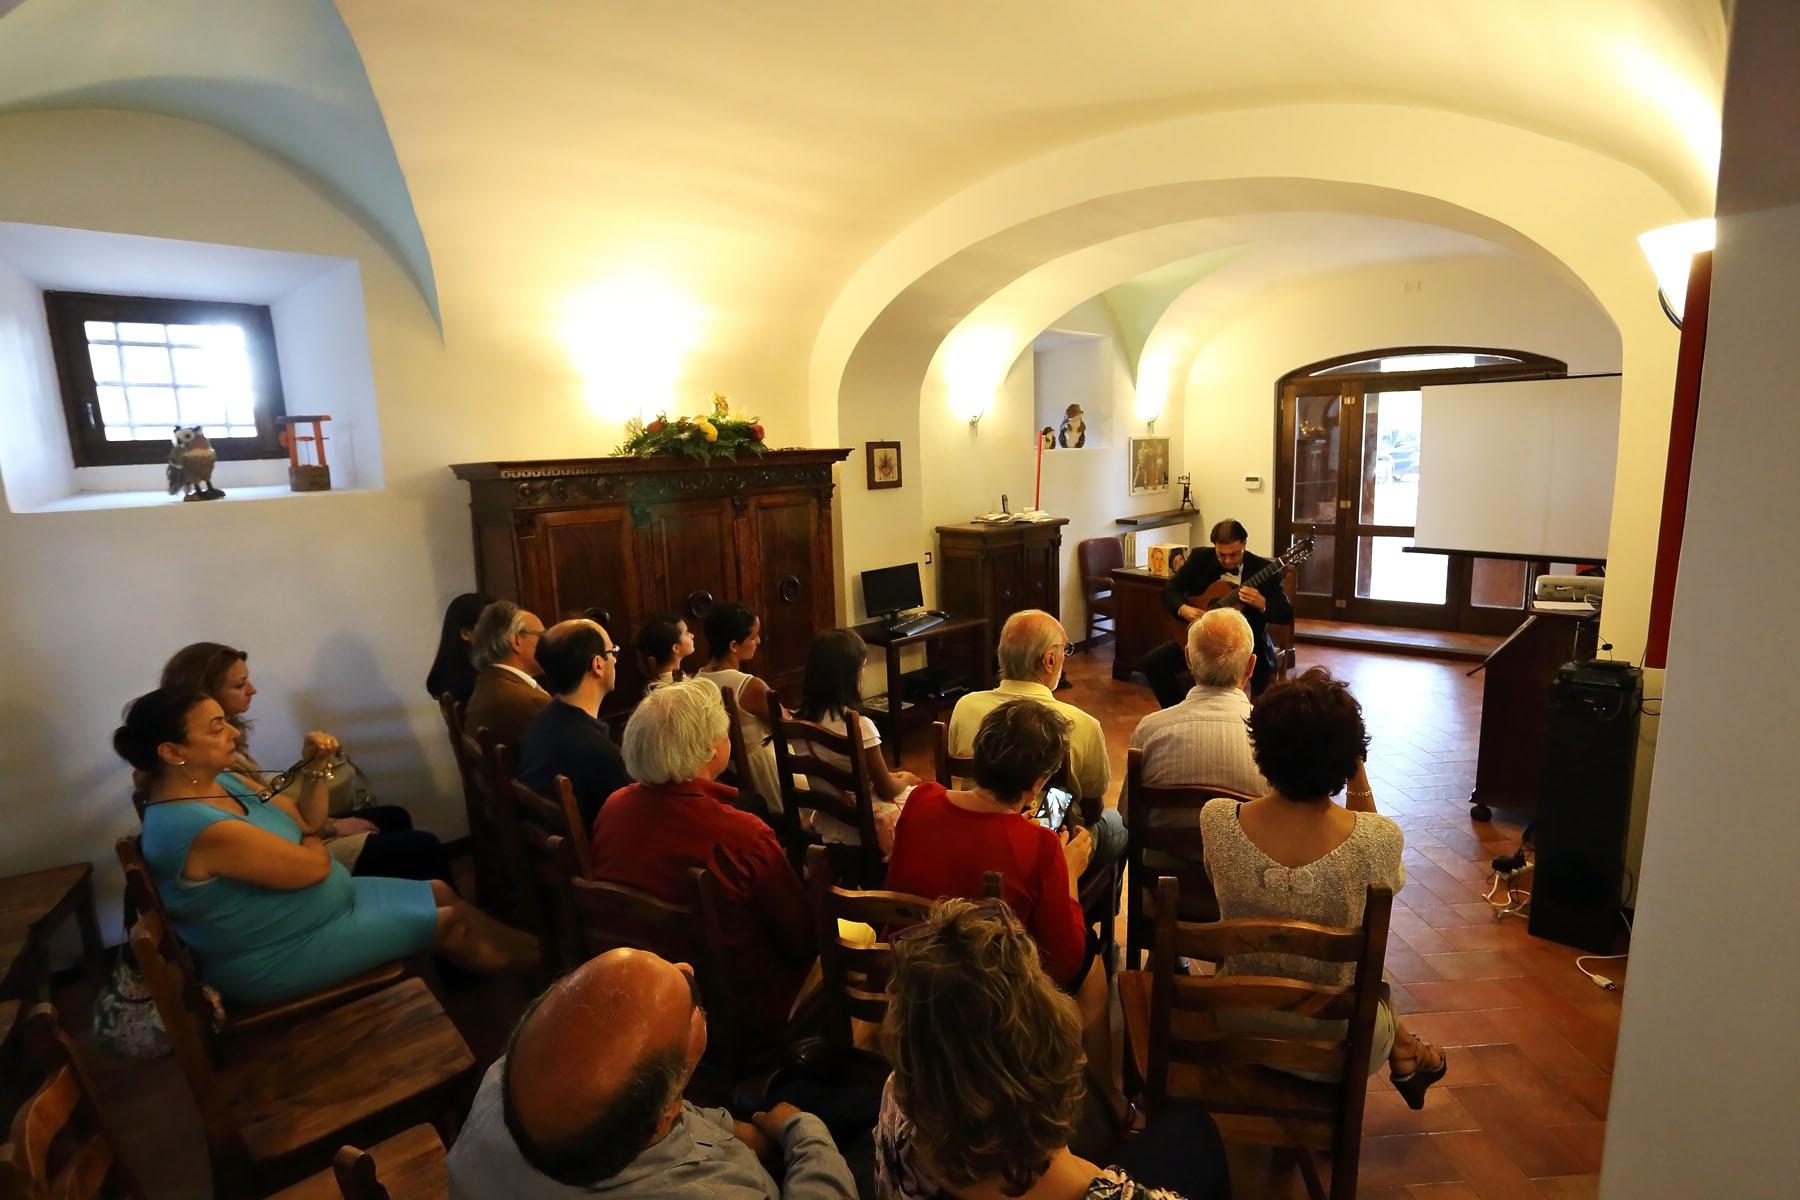 cuisine-marrugio-giugno-2_20140628_1668k